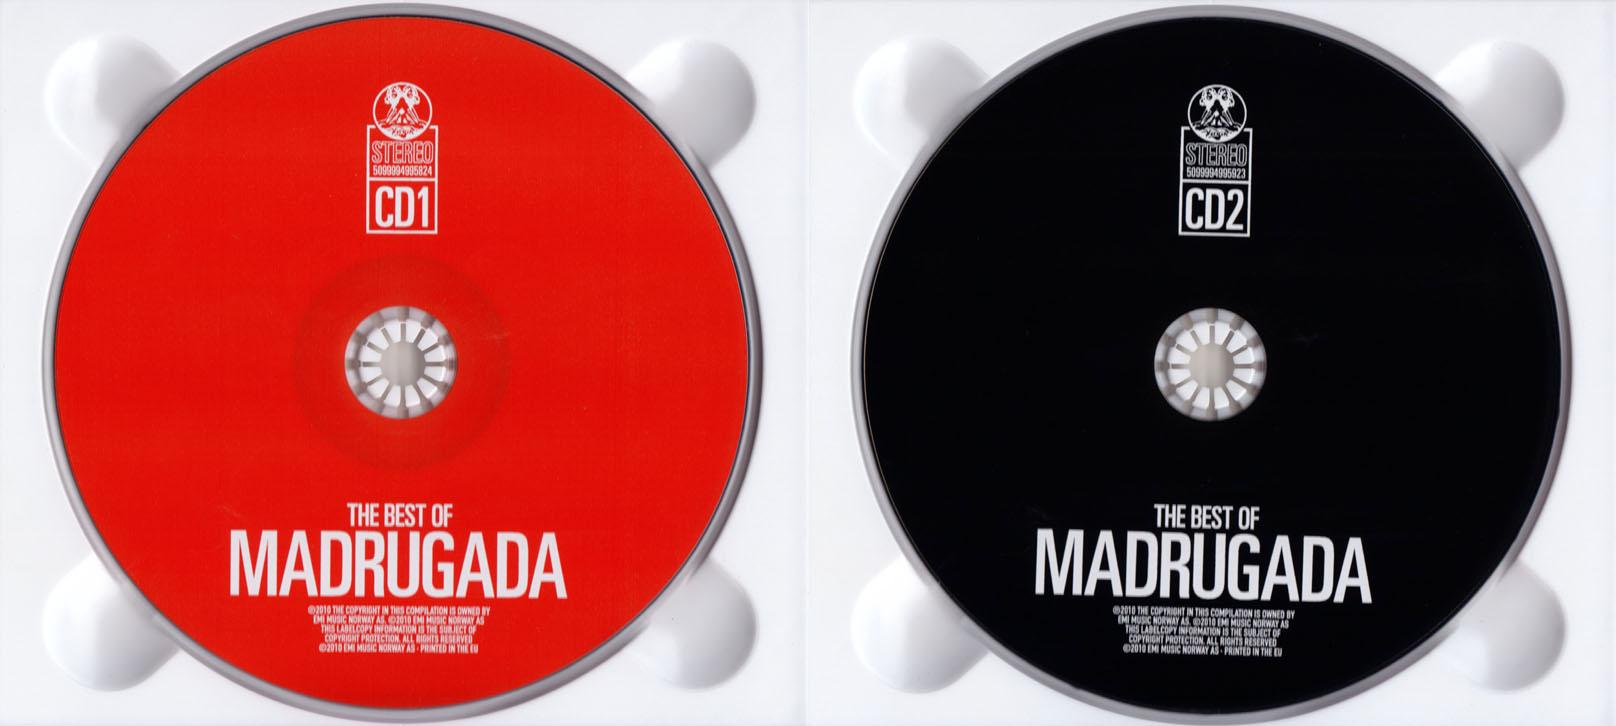 Madrugada - The Best Of Madrugada (2010) 2CD